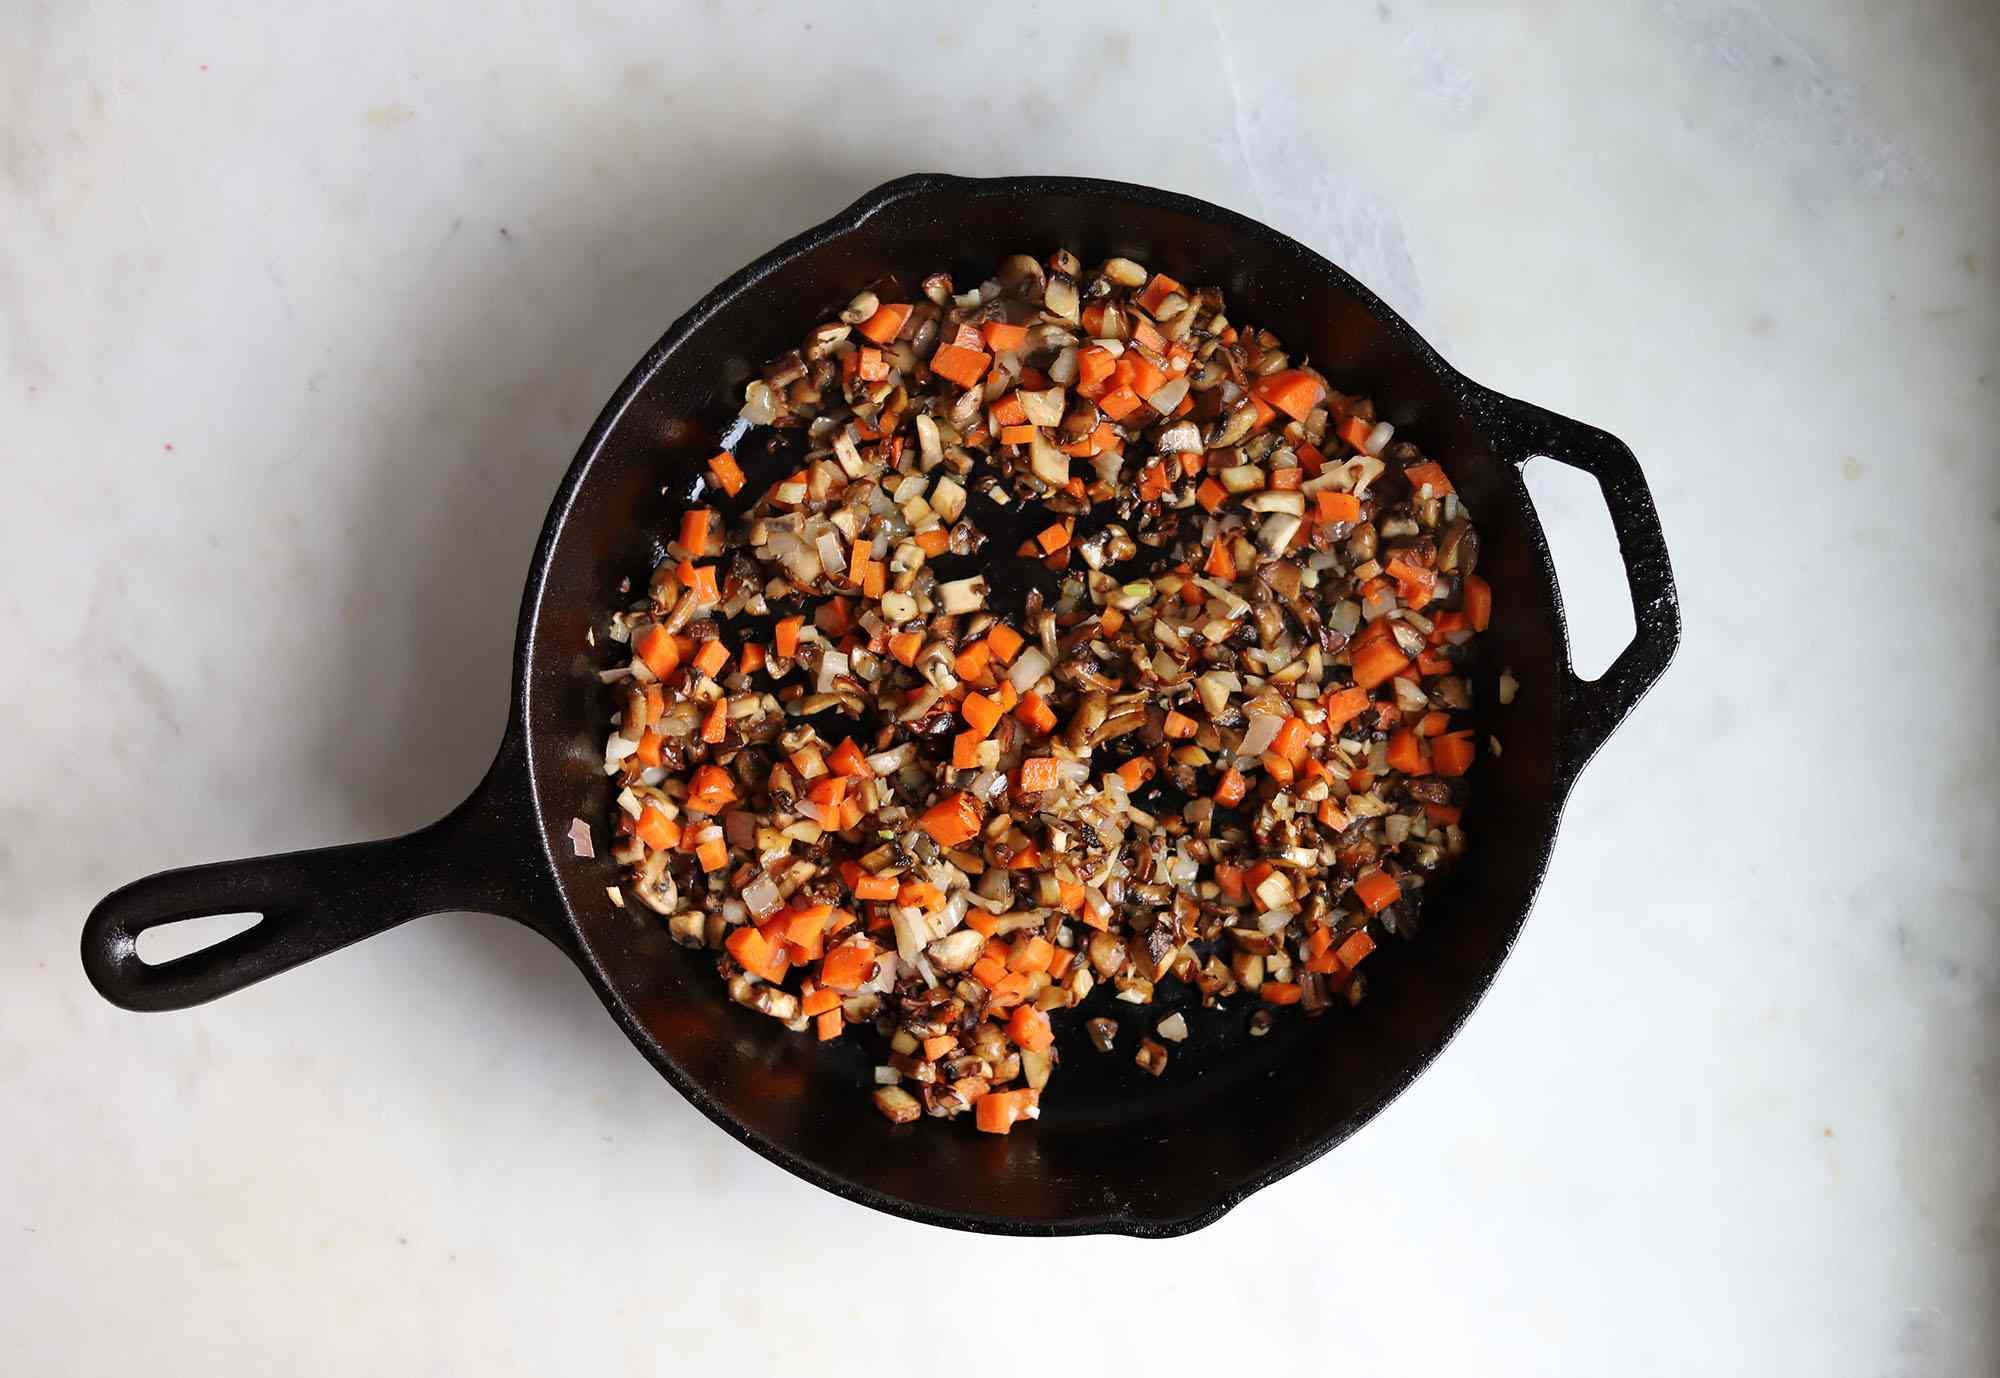 sauteed carrots and mushrooms